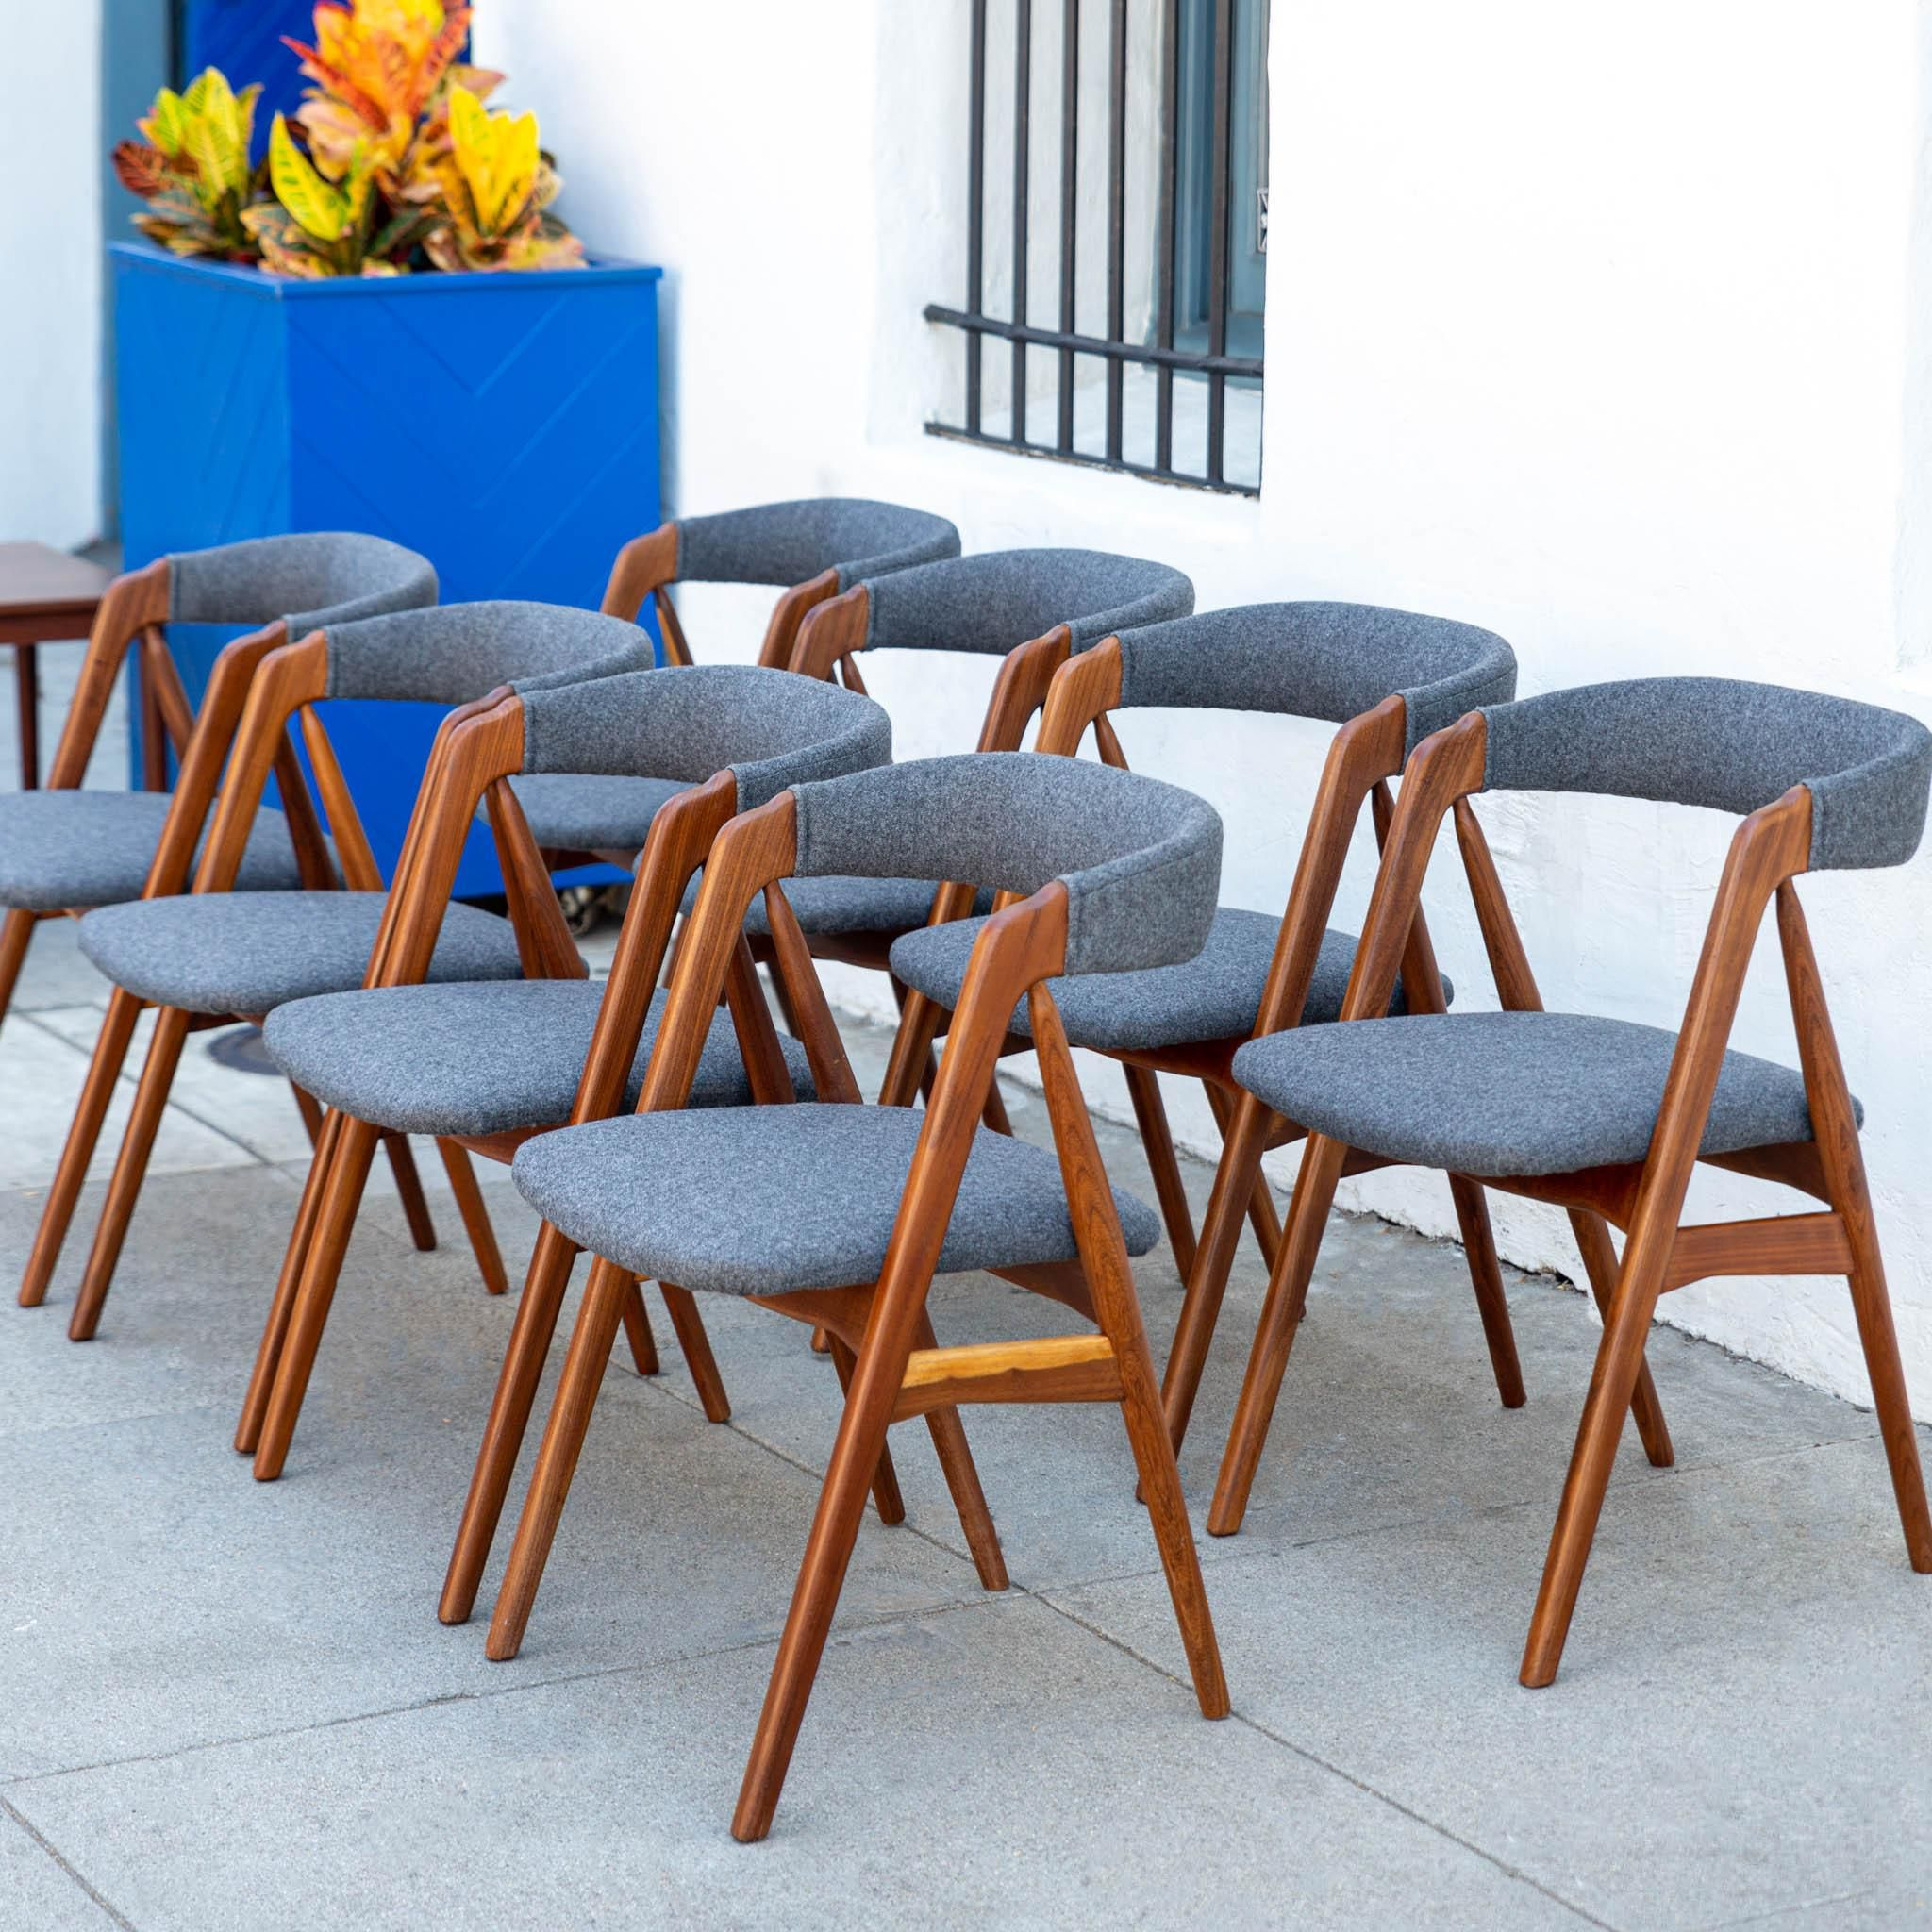 Danish Modern Teak Dining Chairs Set Of 8 Chairish Dining Chairs Chair Teak Dining Table Set of 8 dining chairs